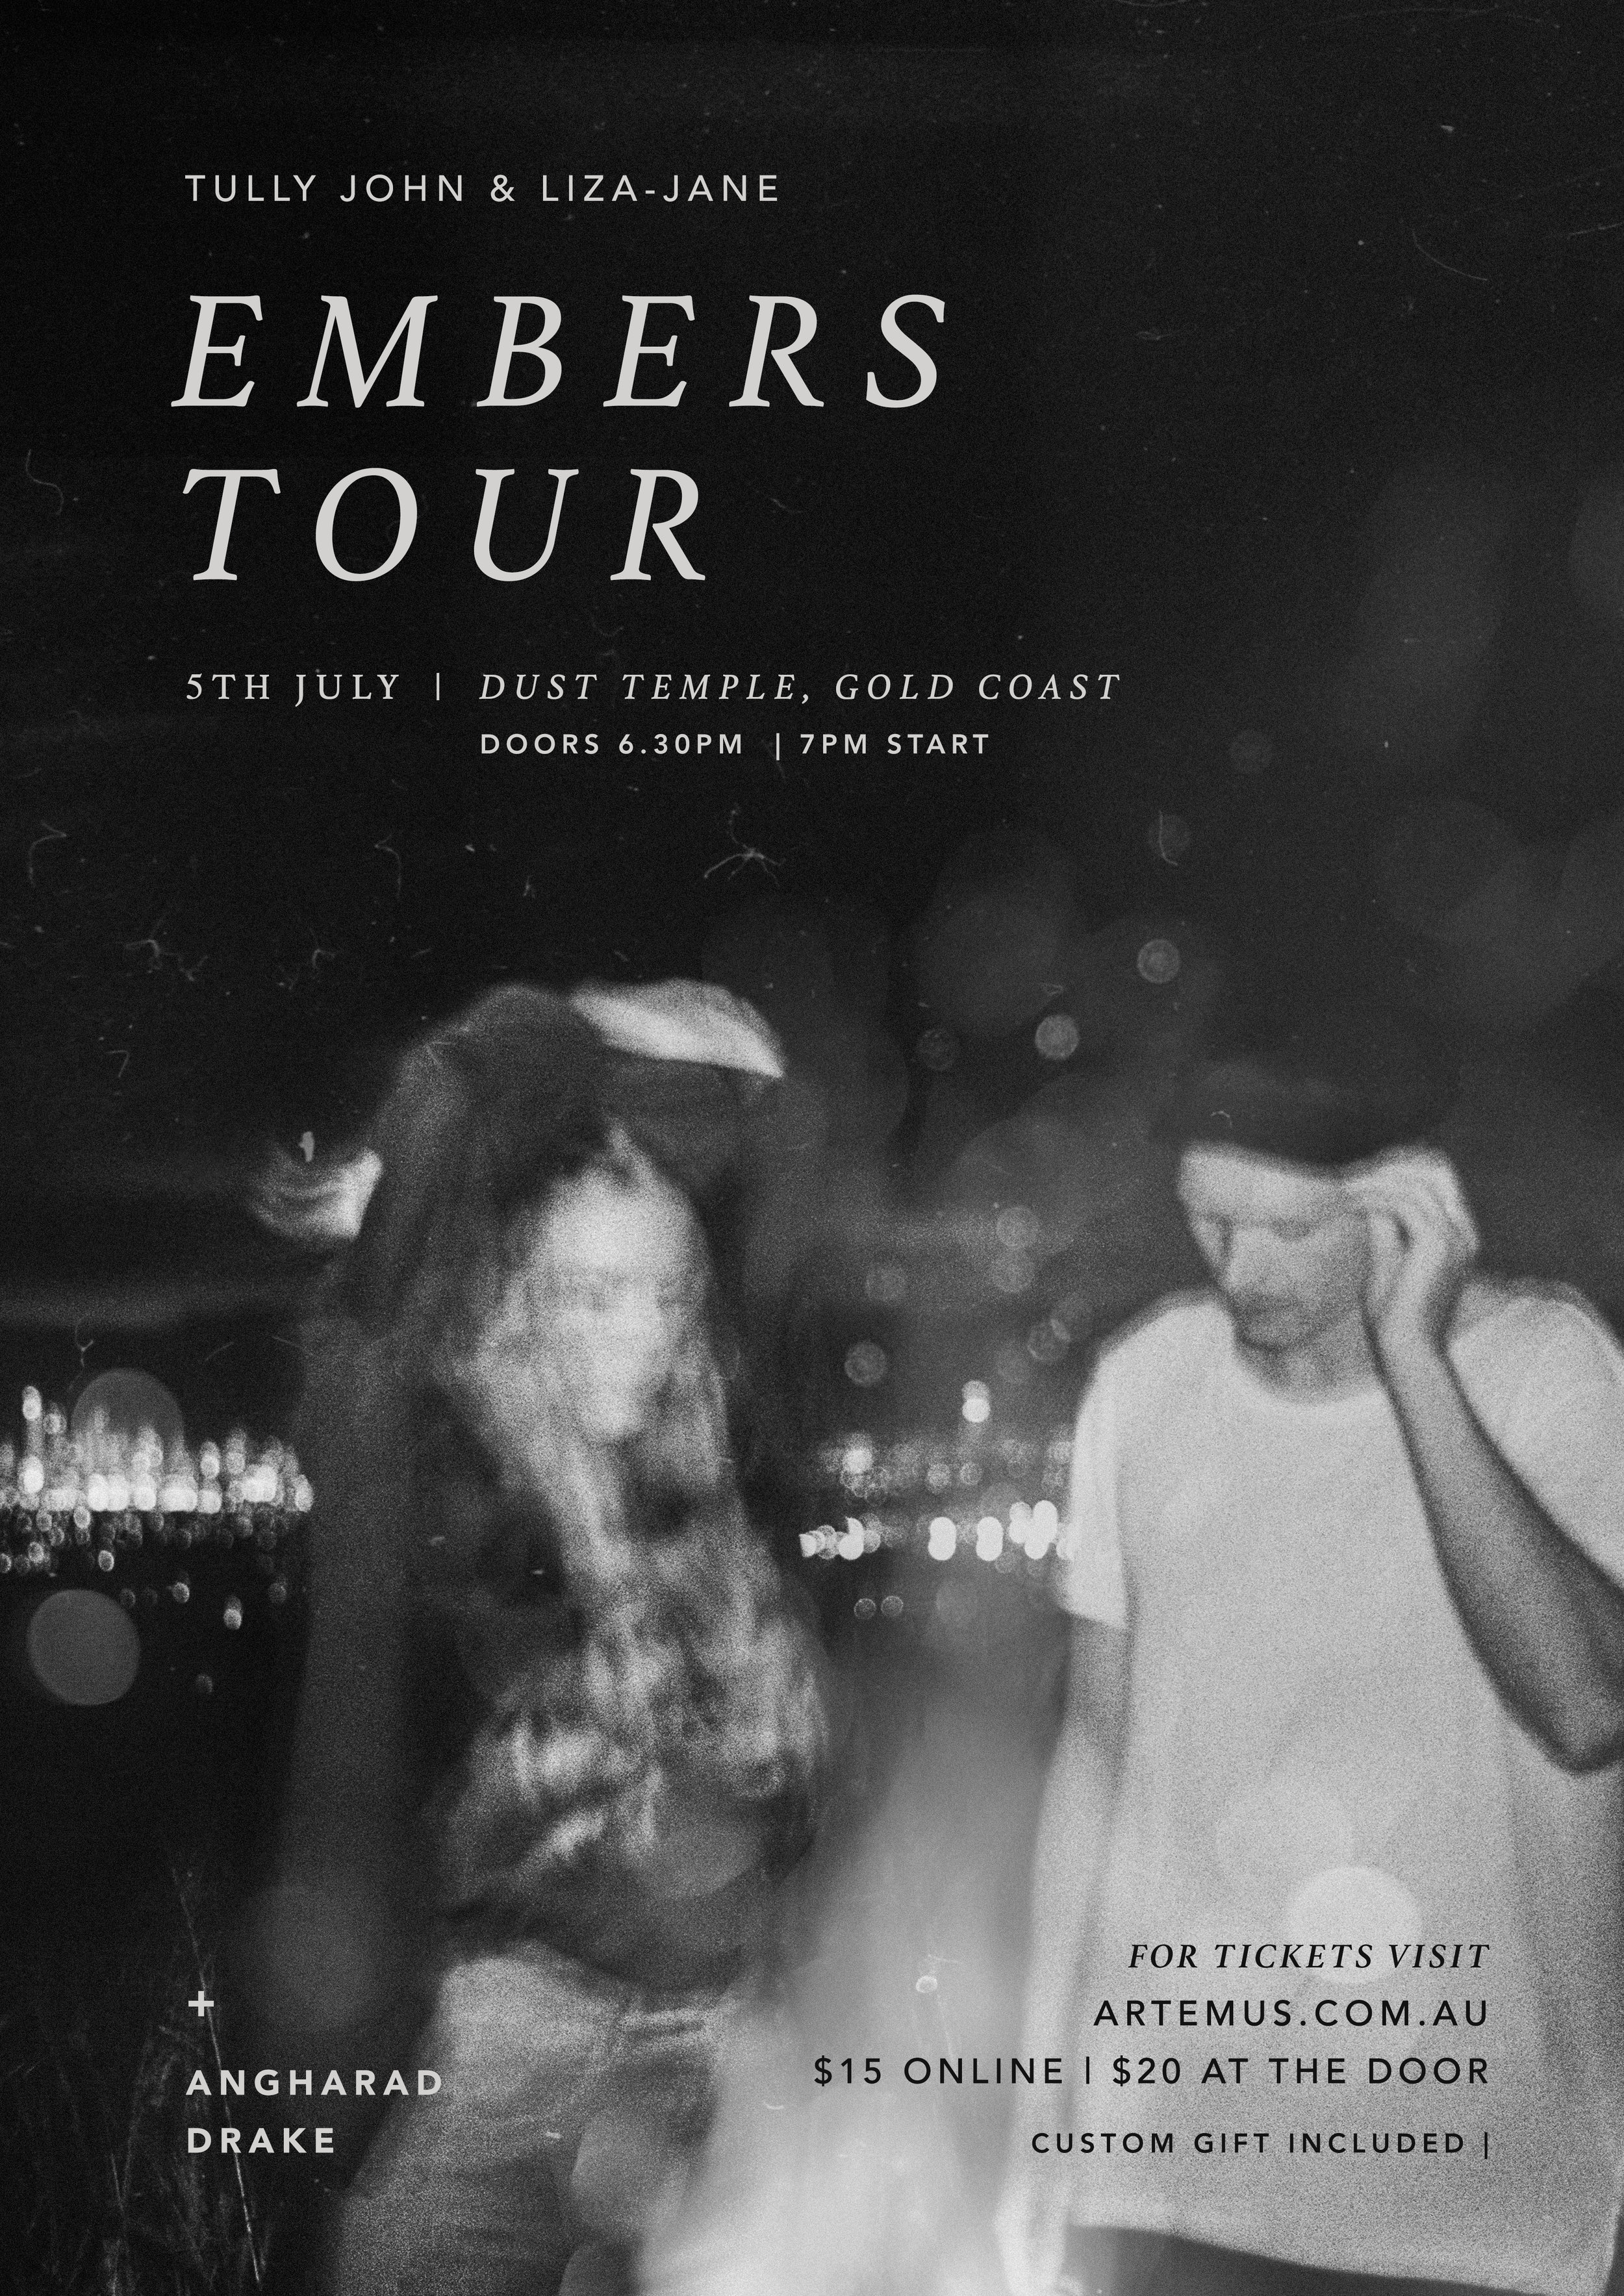 Embers tour flyer_Dust Temple_rev1.jpg